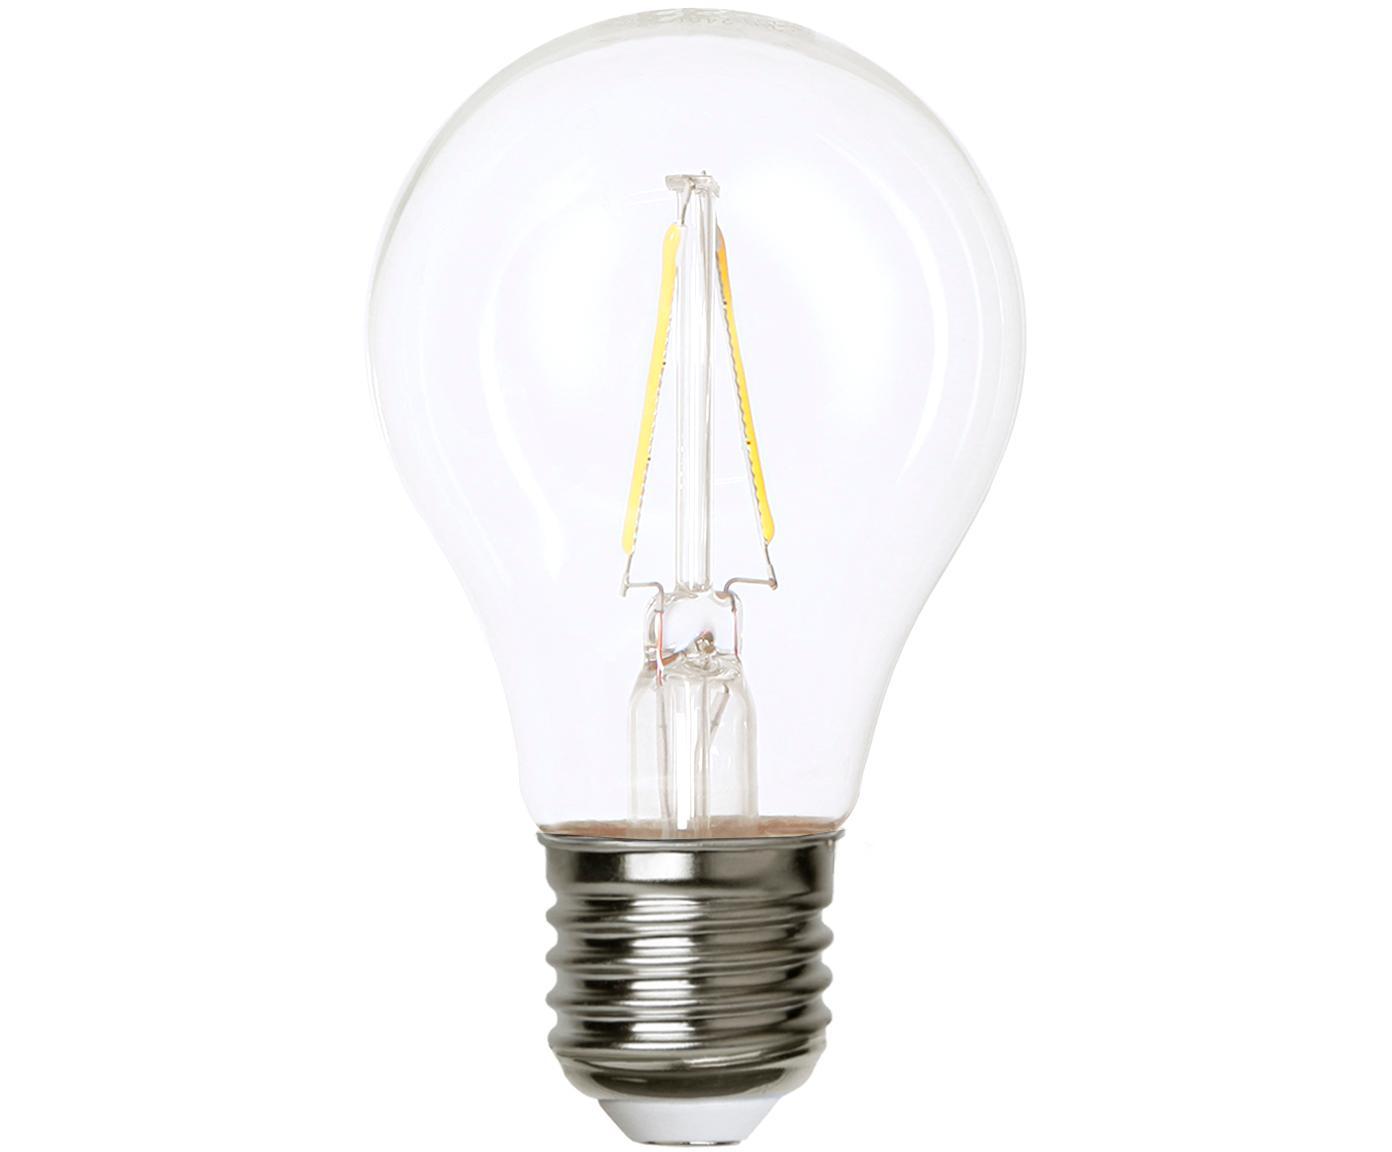 Żarówka LED Airtight Two (E27/2W) 5 szt., Transparentny, nikiel, Ø 6 x W 11 cm